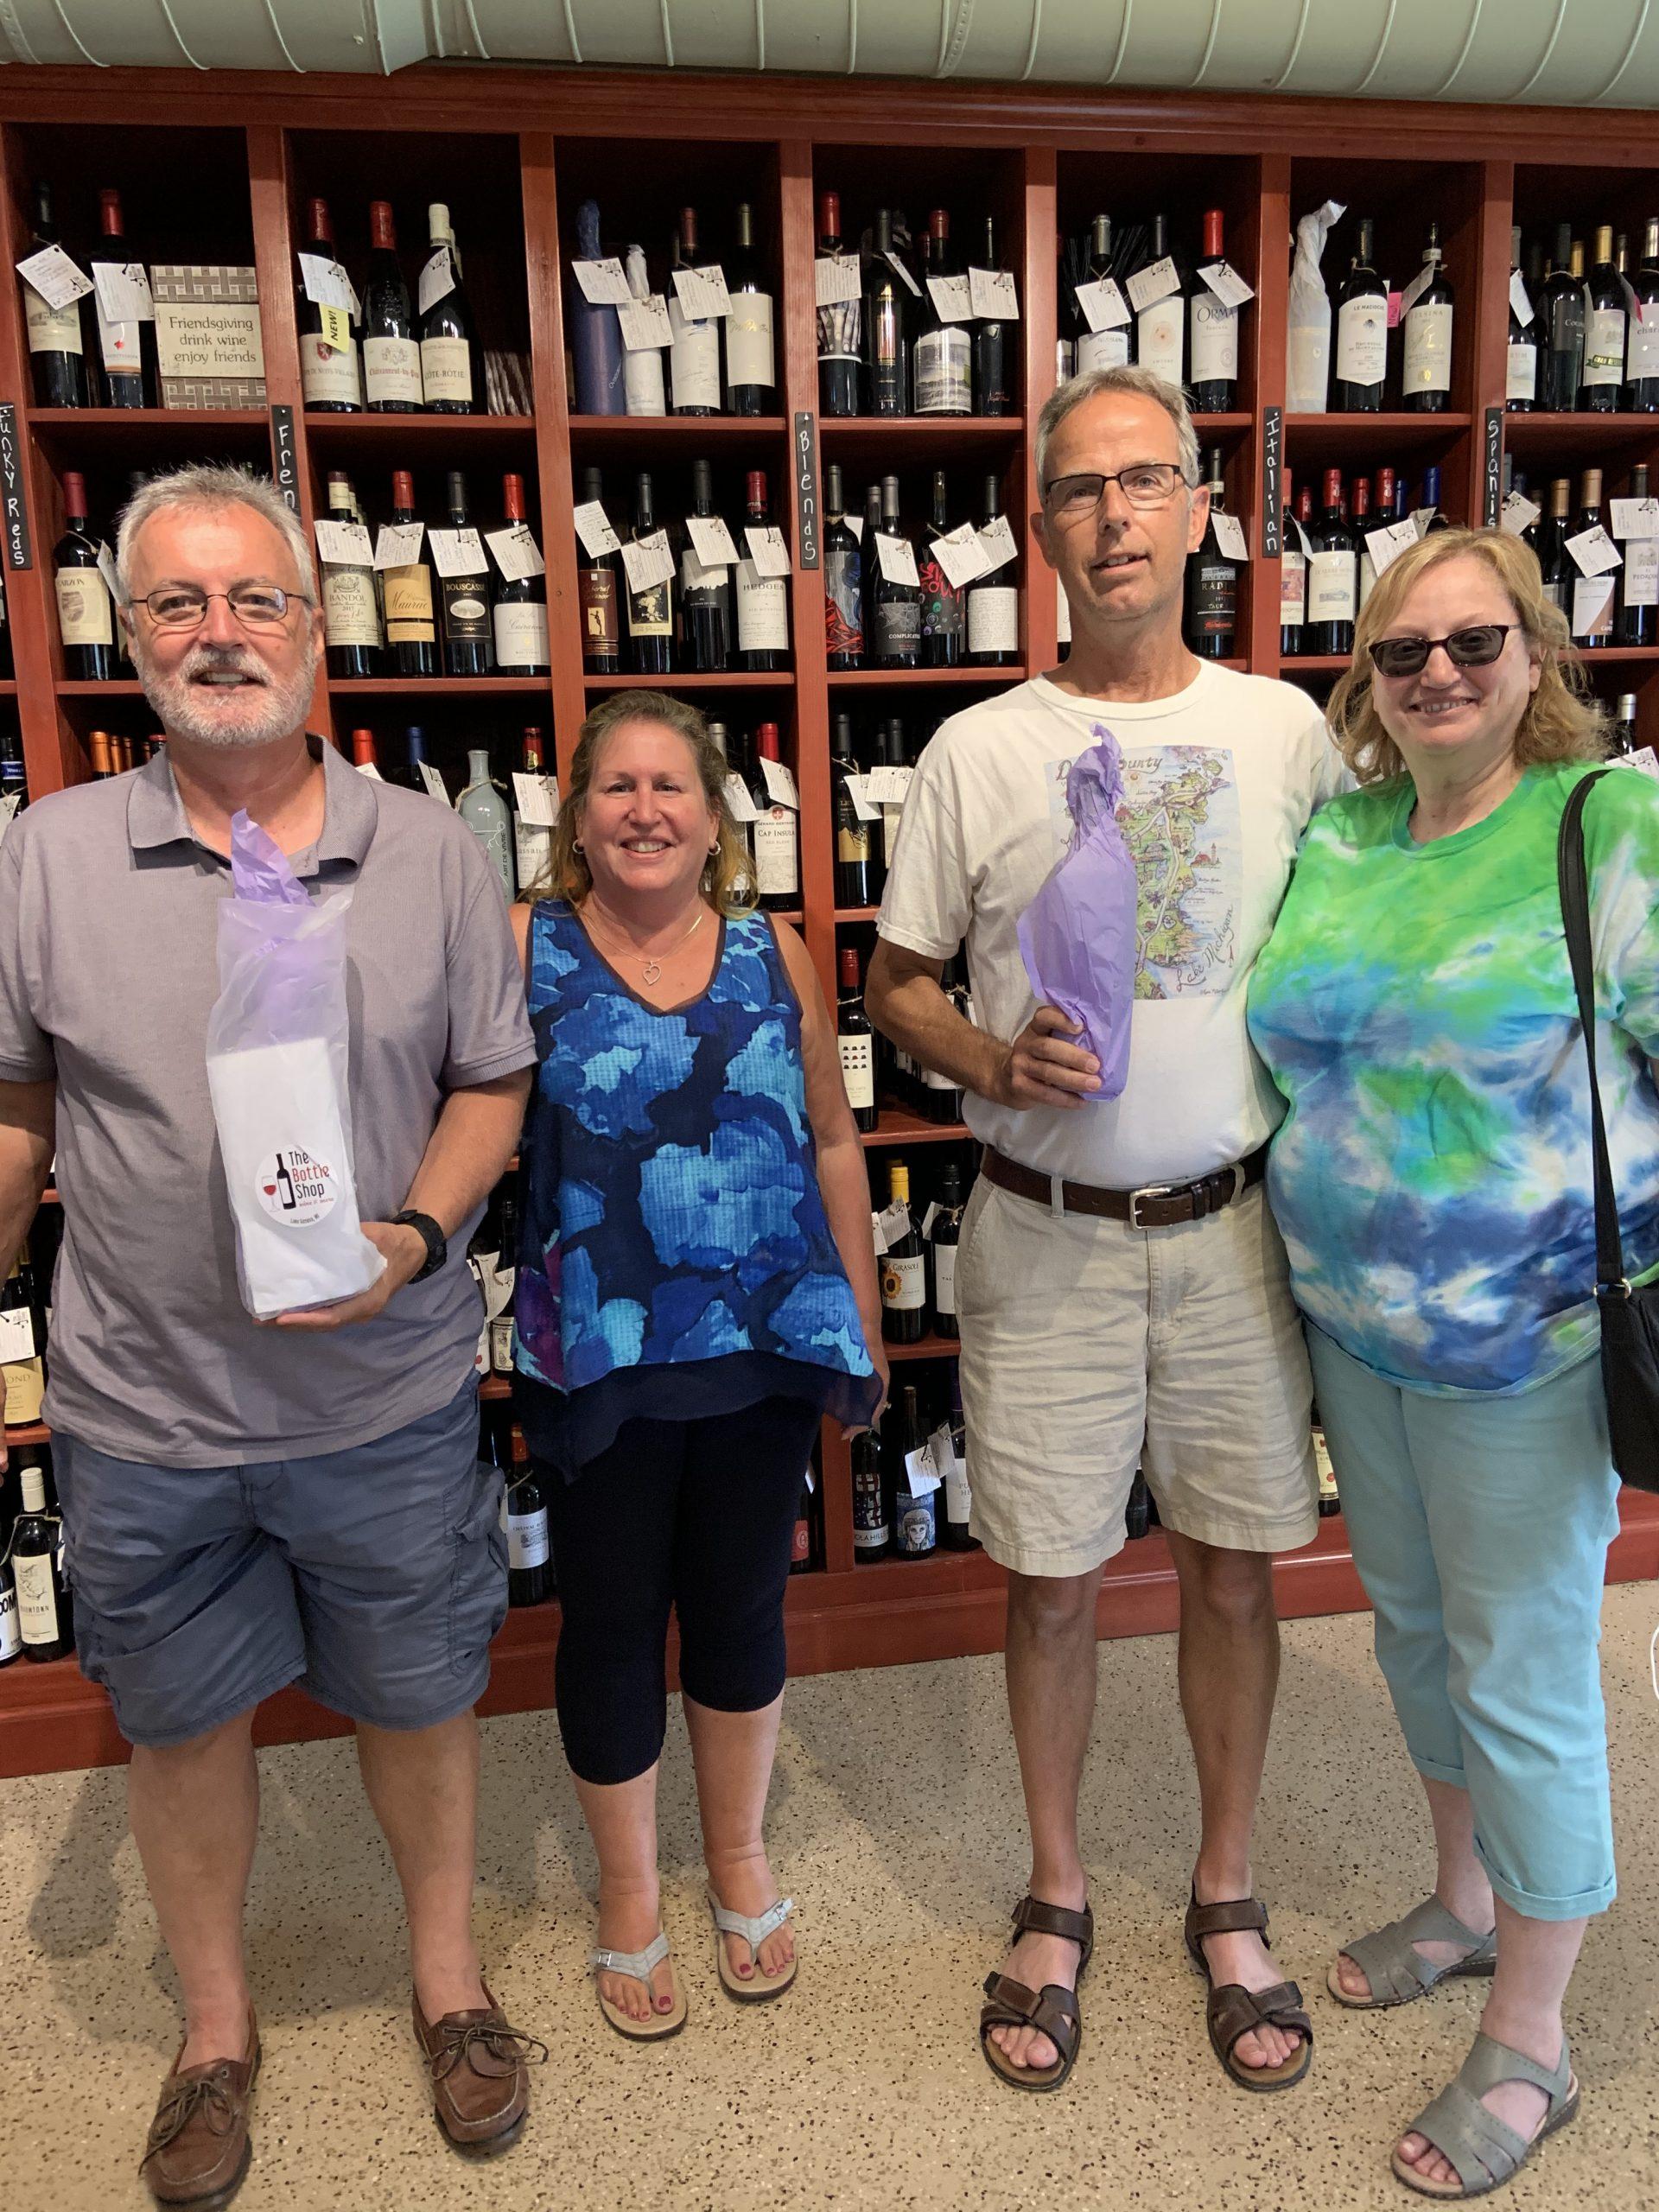 Wine club pick up